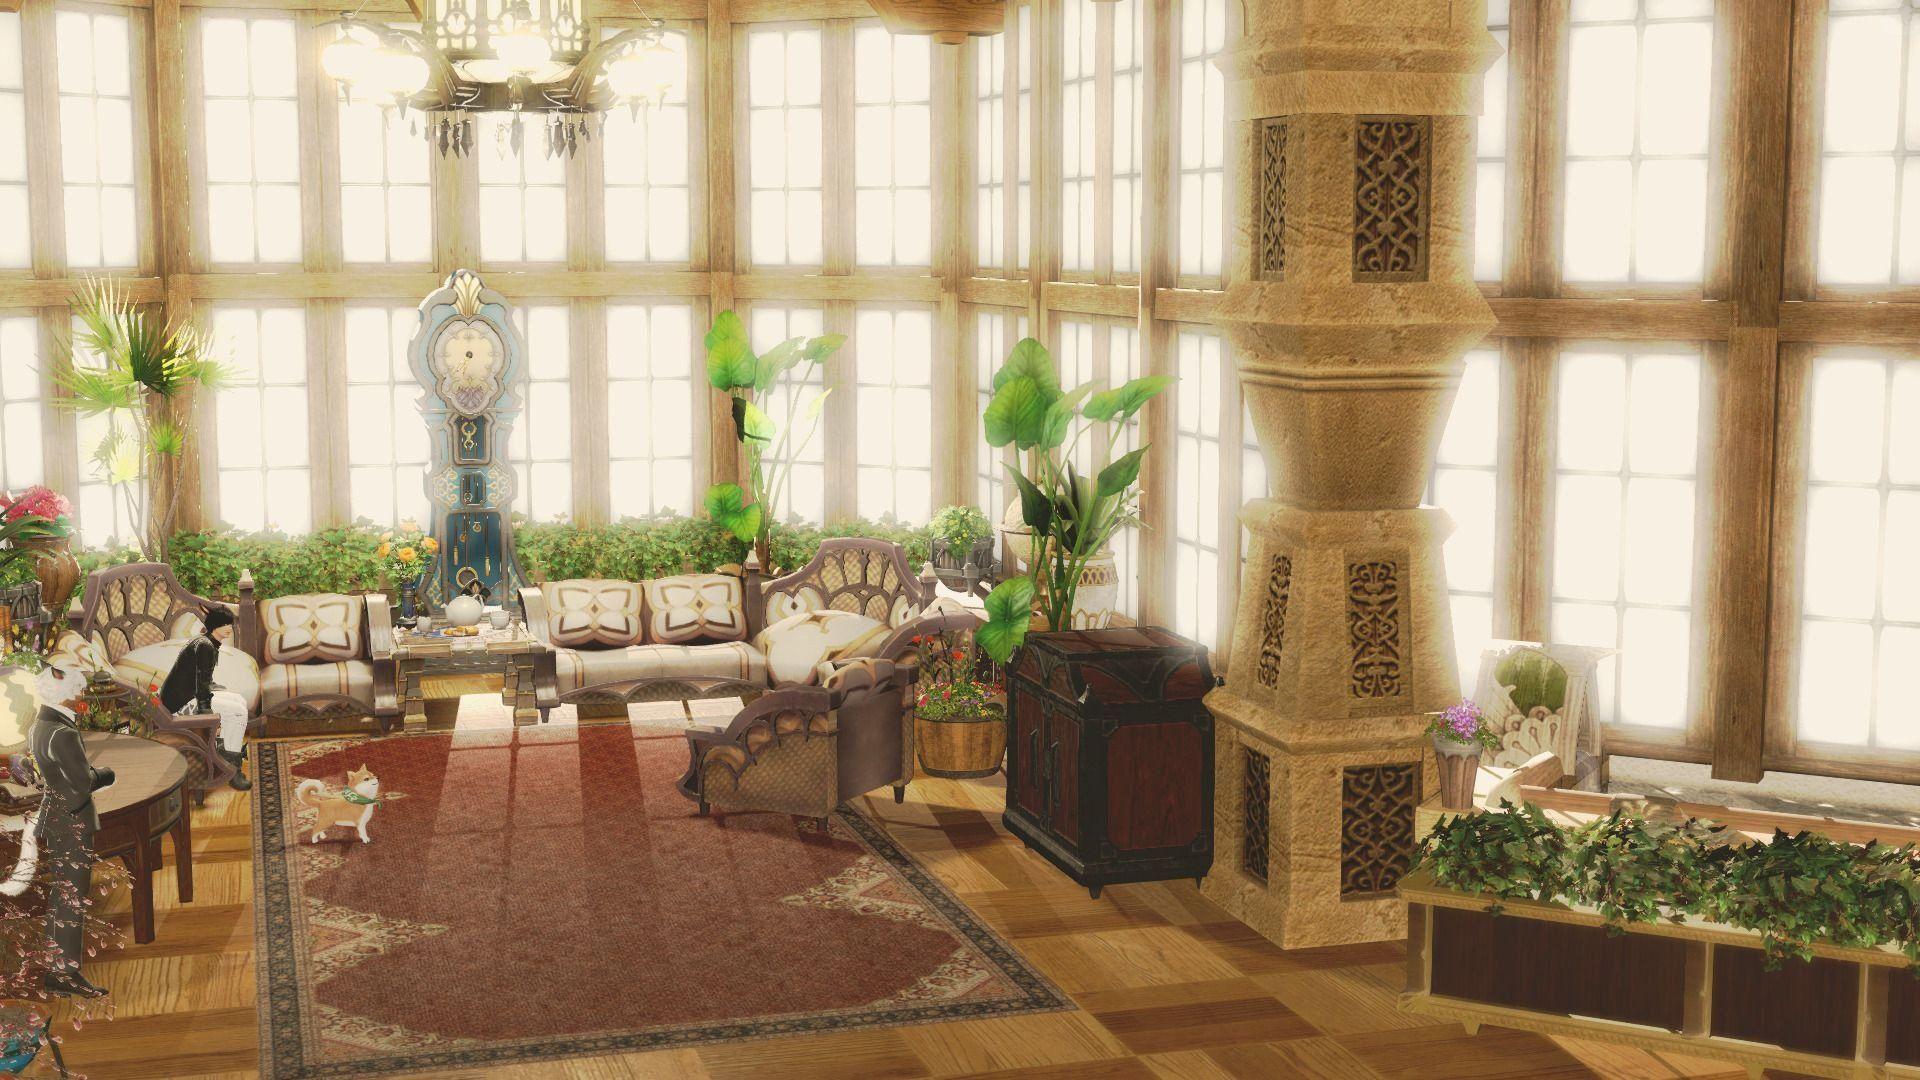 Ffxiv housing decoration ideas fresh leslie lkhol be0447